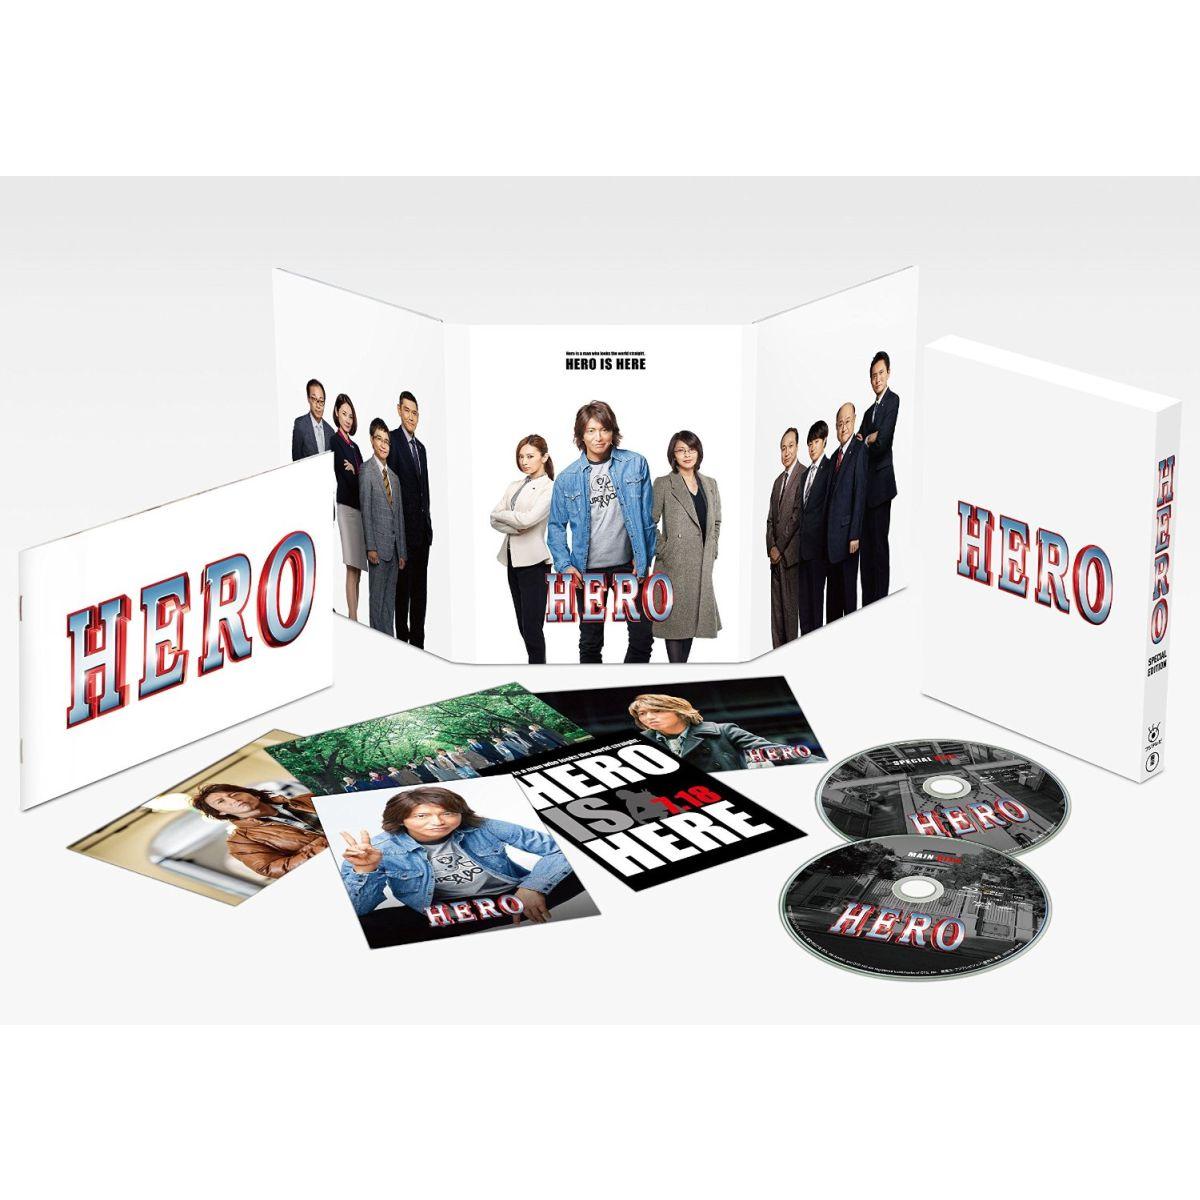 HERO Blu-ray スペシャル・エディション(2015)【Blu-ray】 [ 木村拓哉 ]